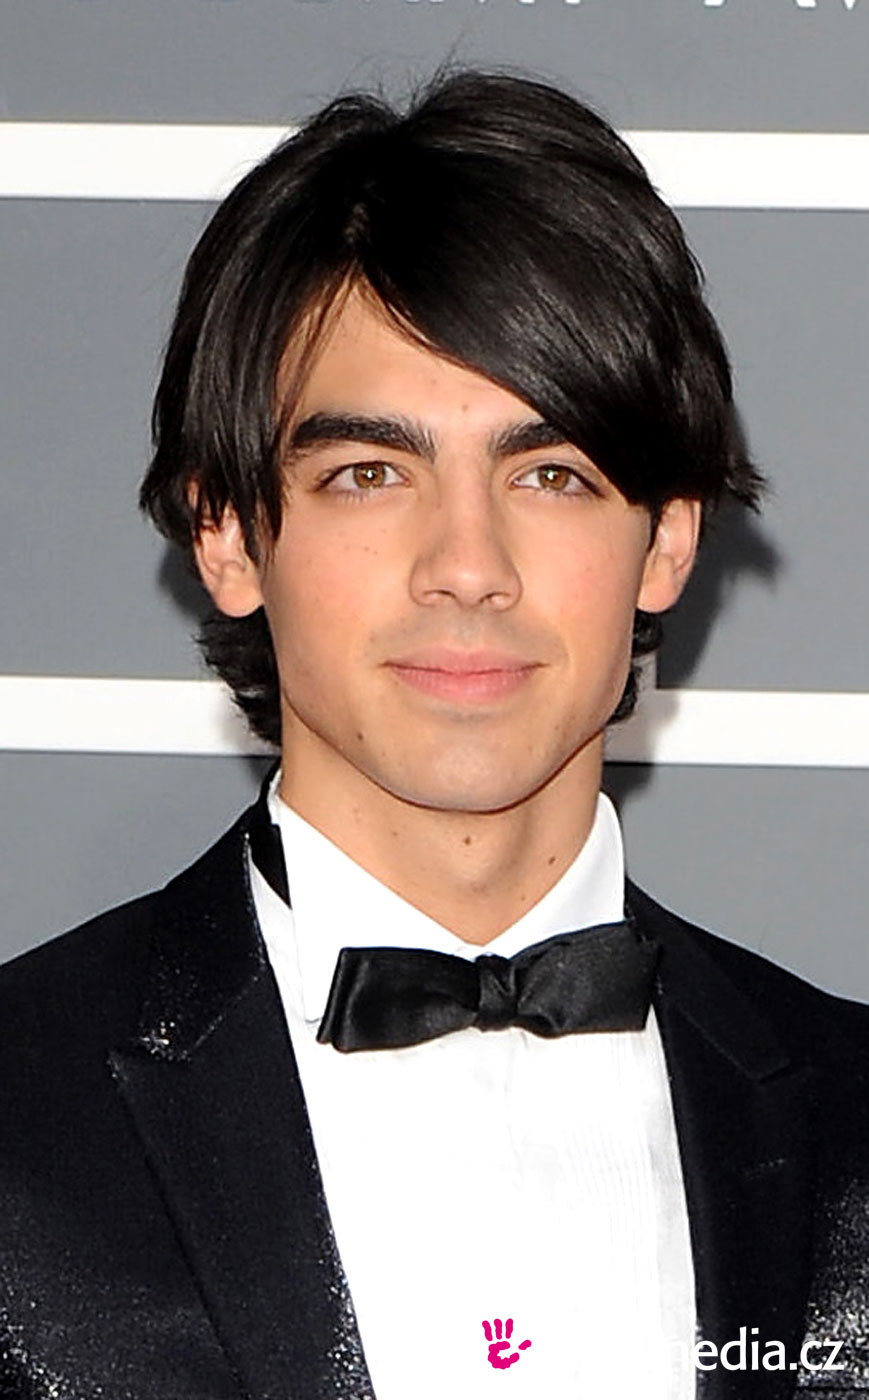 Joe Jonas Hairstyle Easyhairstyler